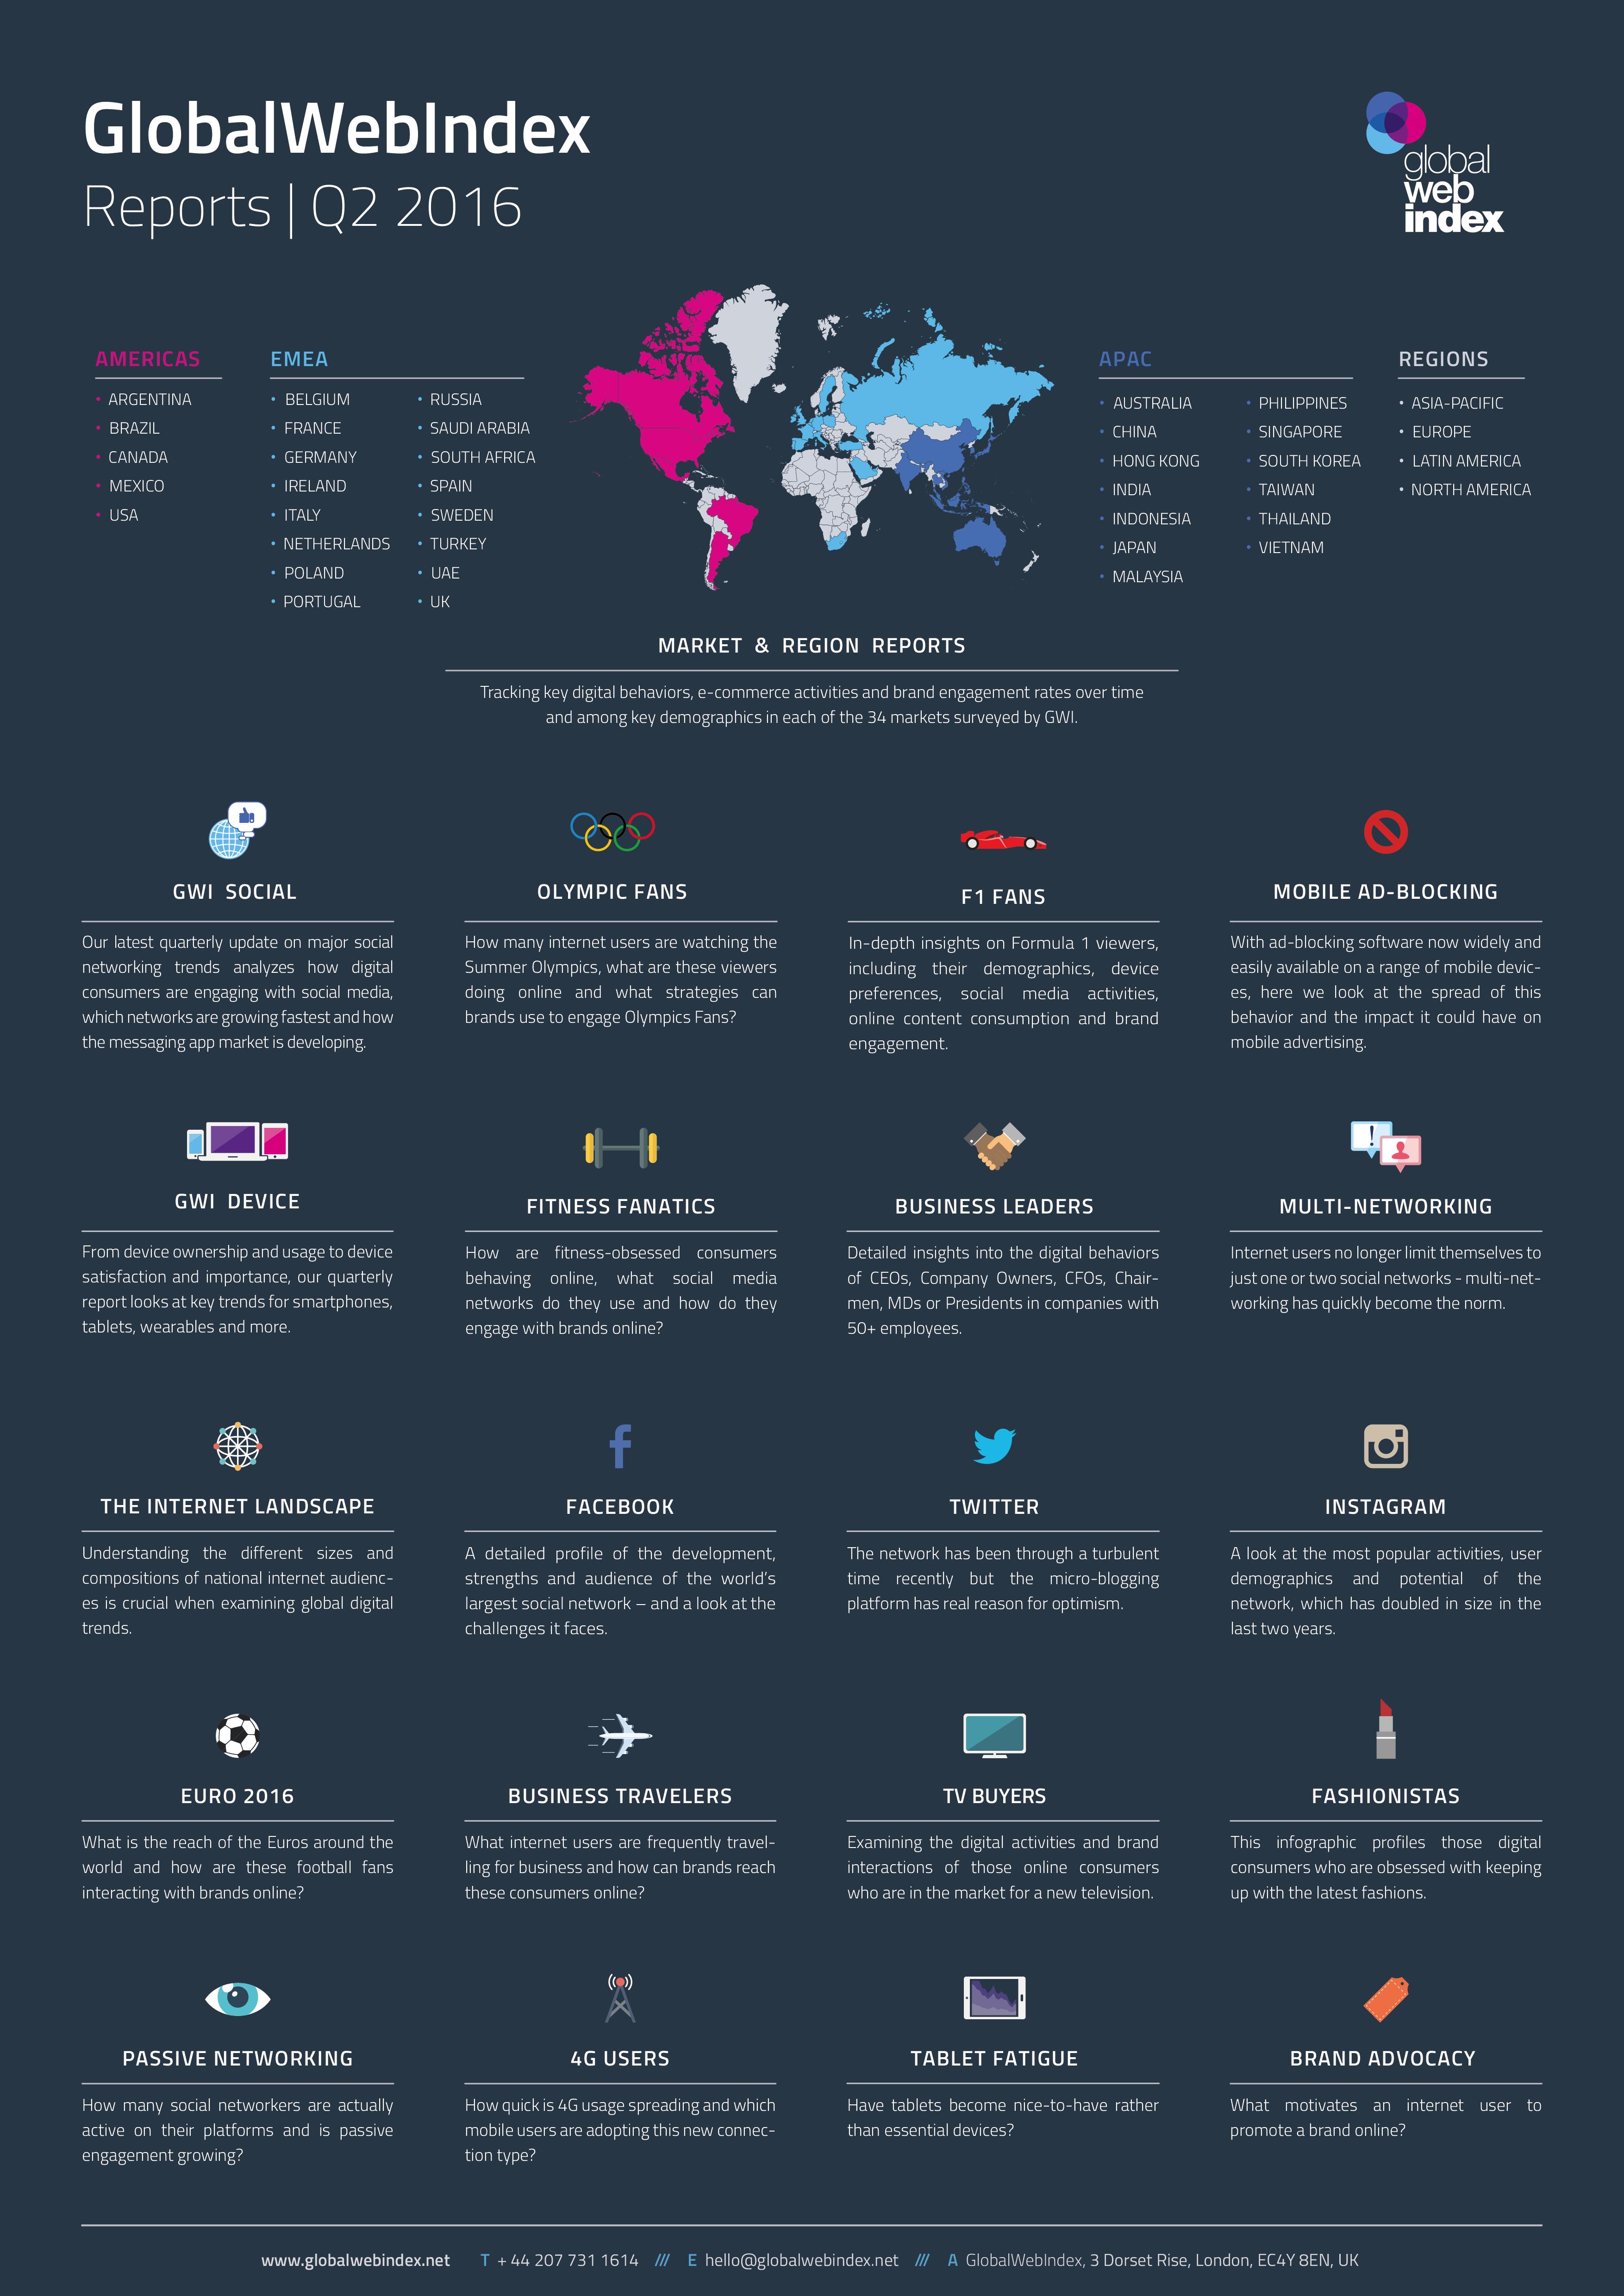 Q2 2016 Reports from GlobalWebIndex